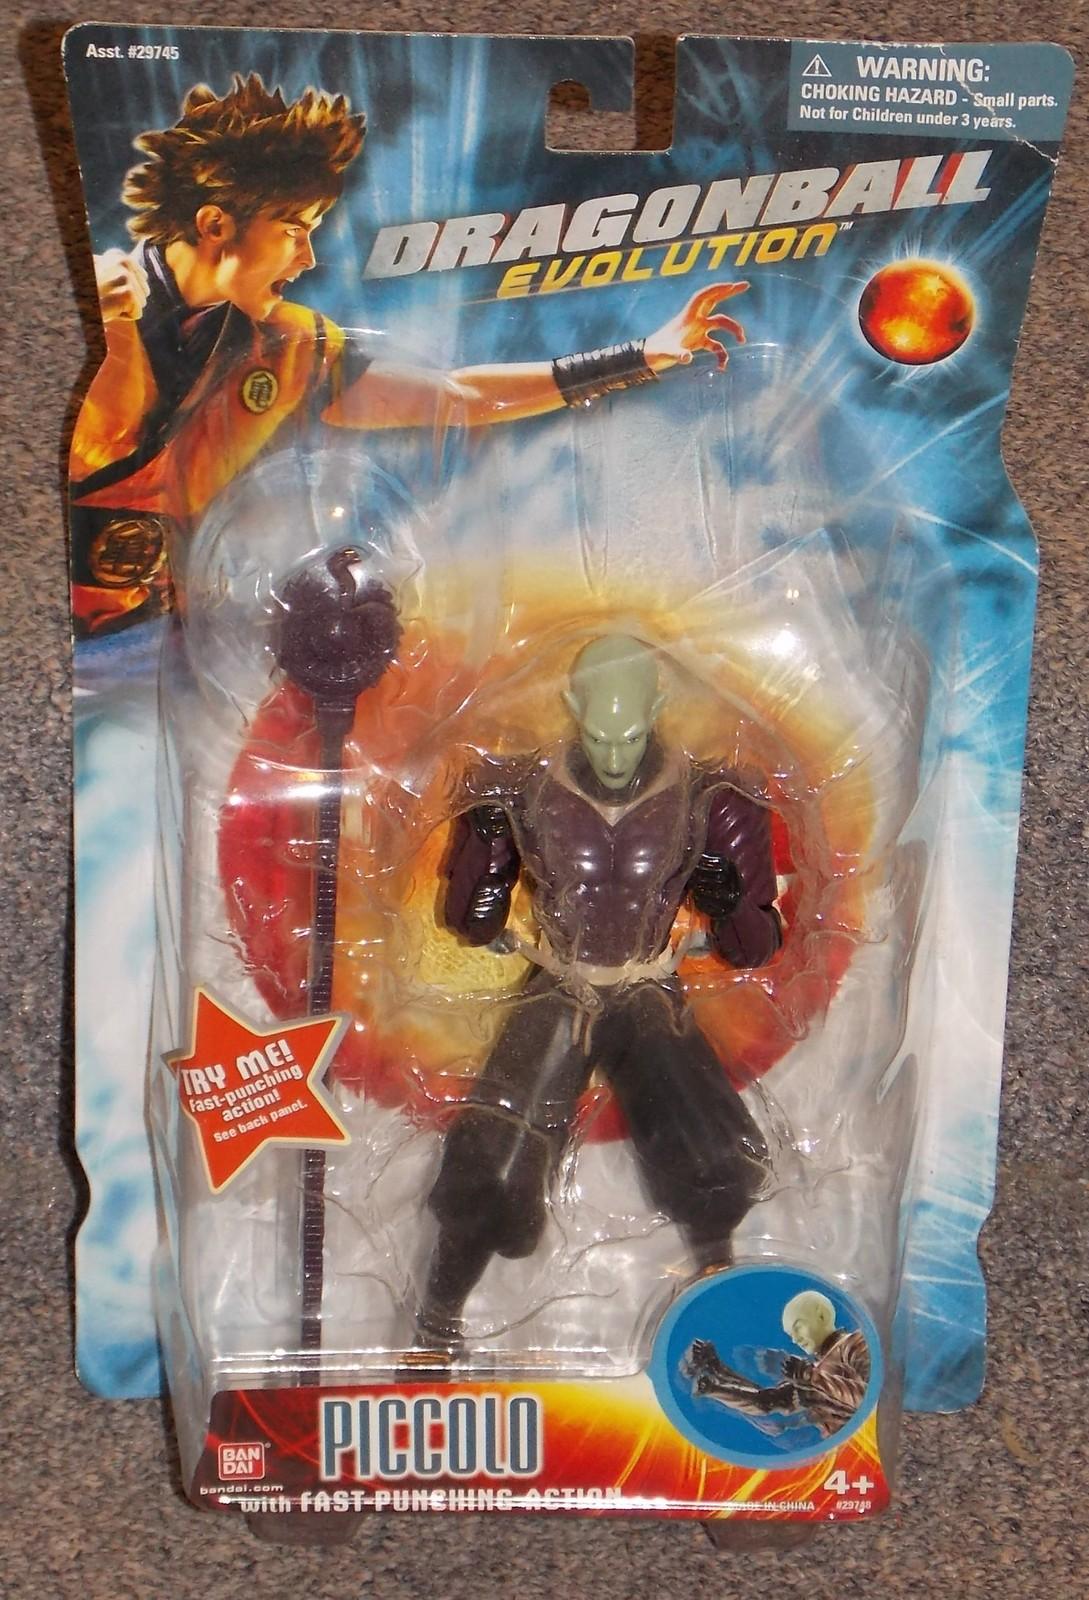 Piccolo     NEW Dragonball Z Earth SP HG Gashapon Figure